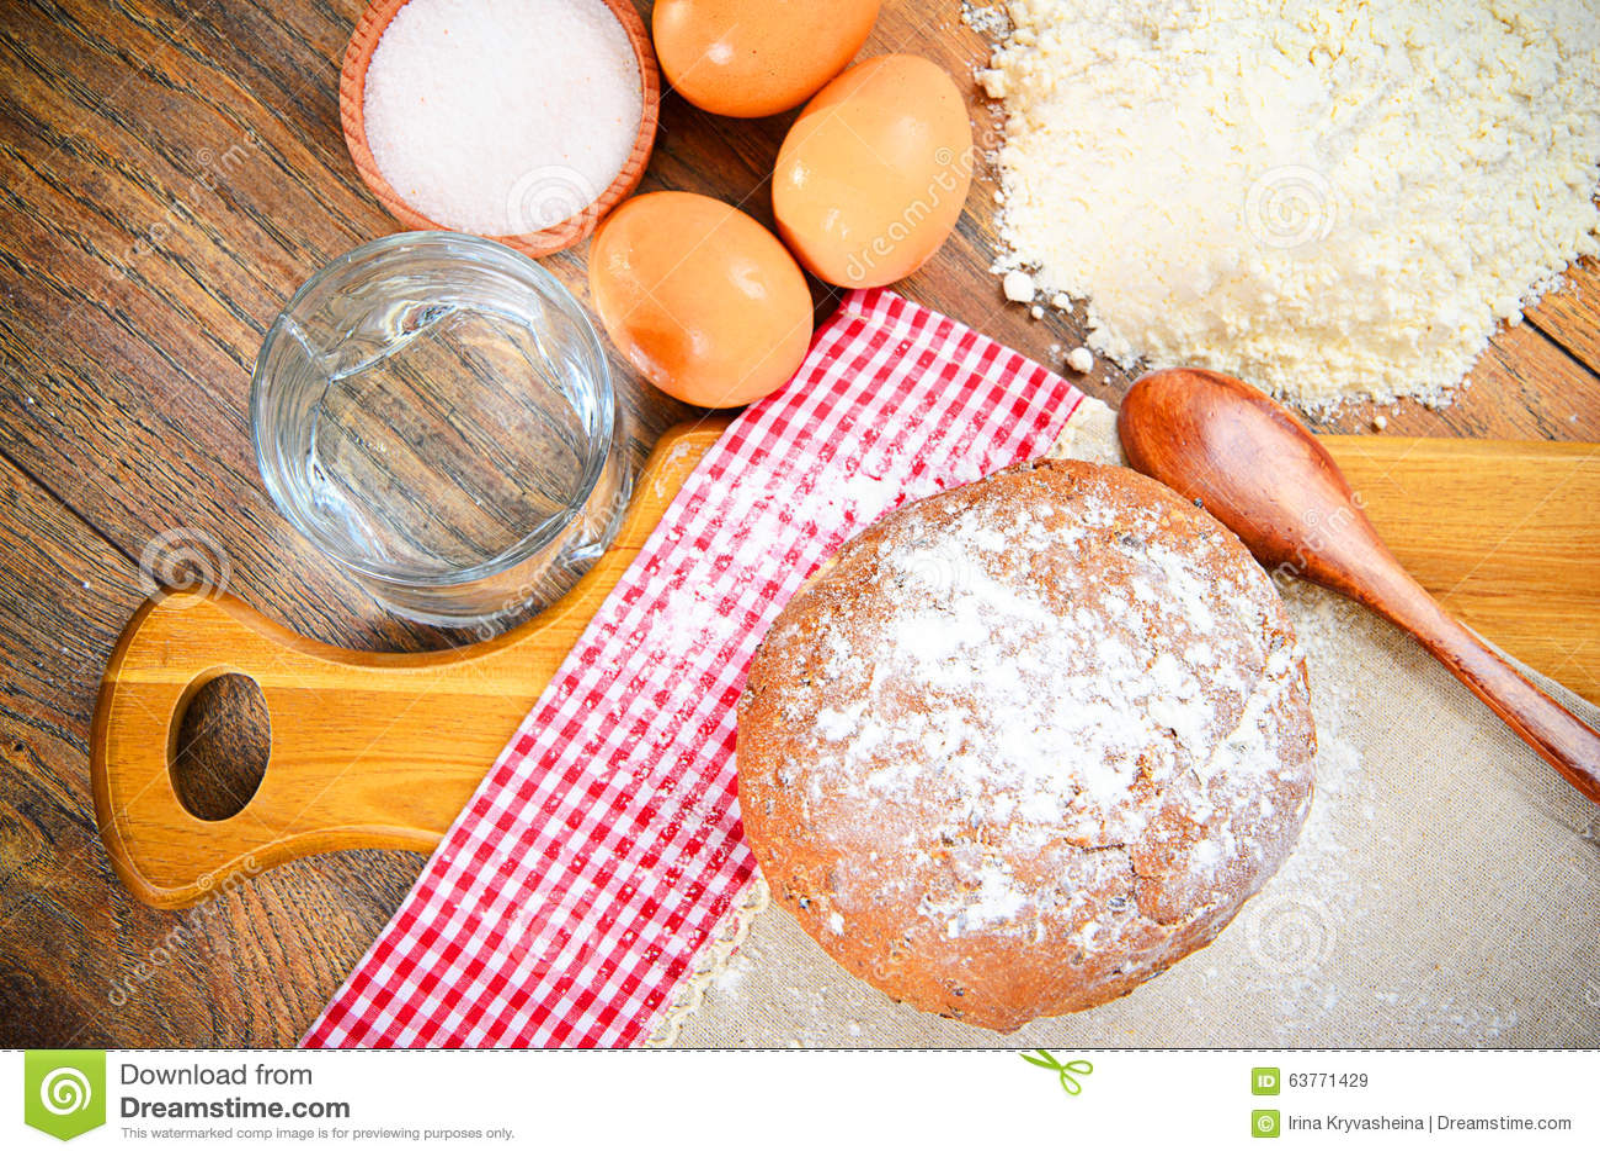 pain farine oeuf l 39 eau baking image stock image du baking brioche 63771429. Black Bedroom Furniture Sets. Home Design Ideas